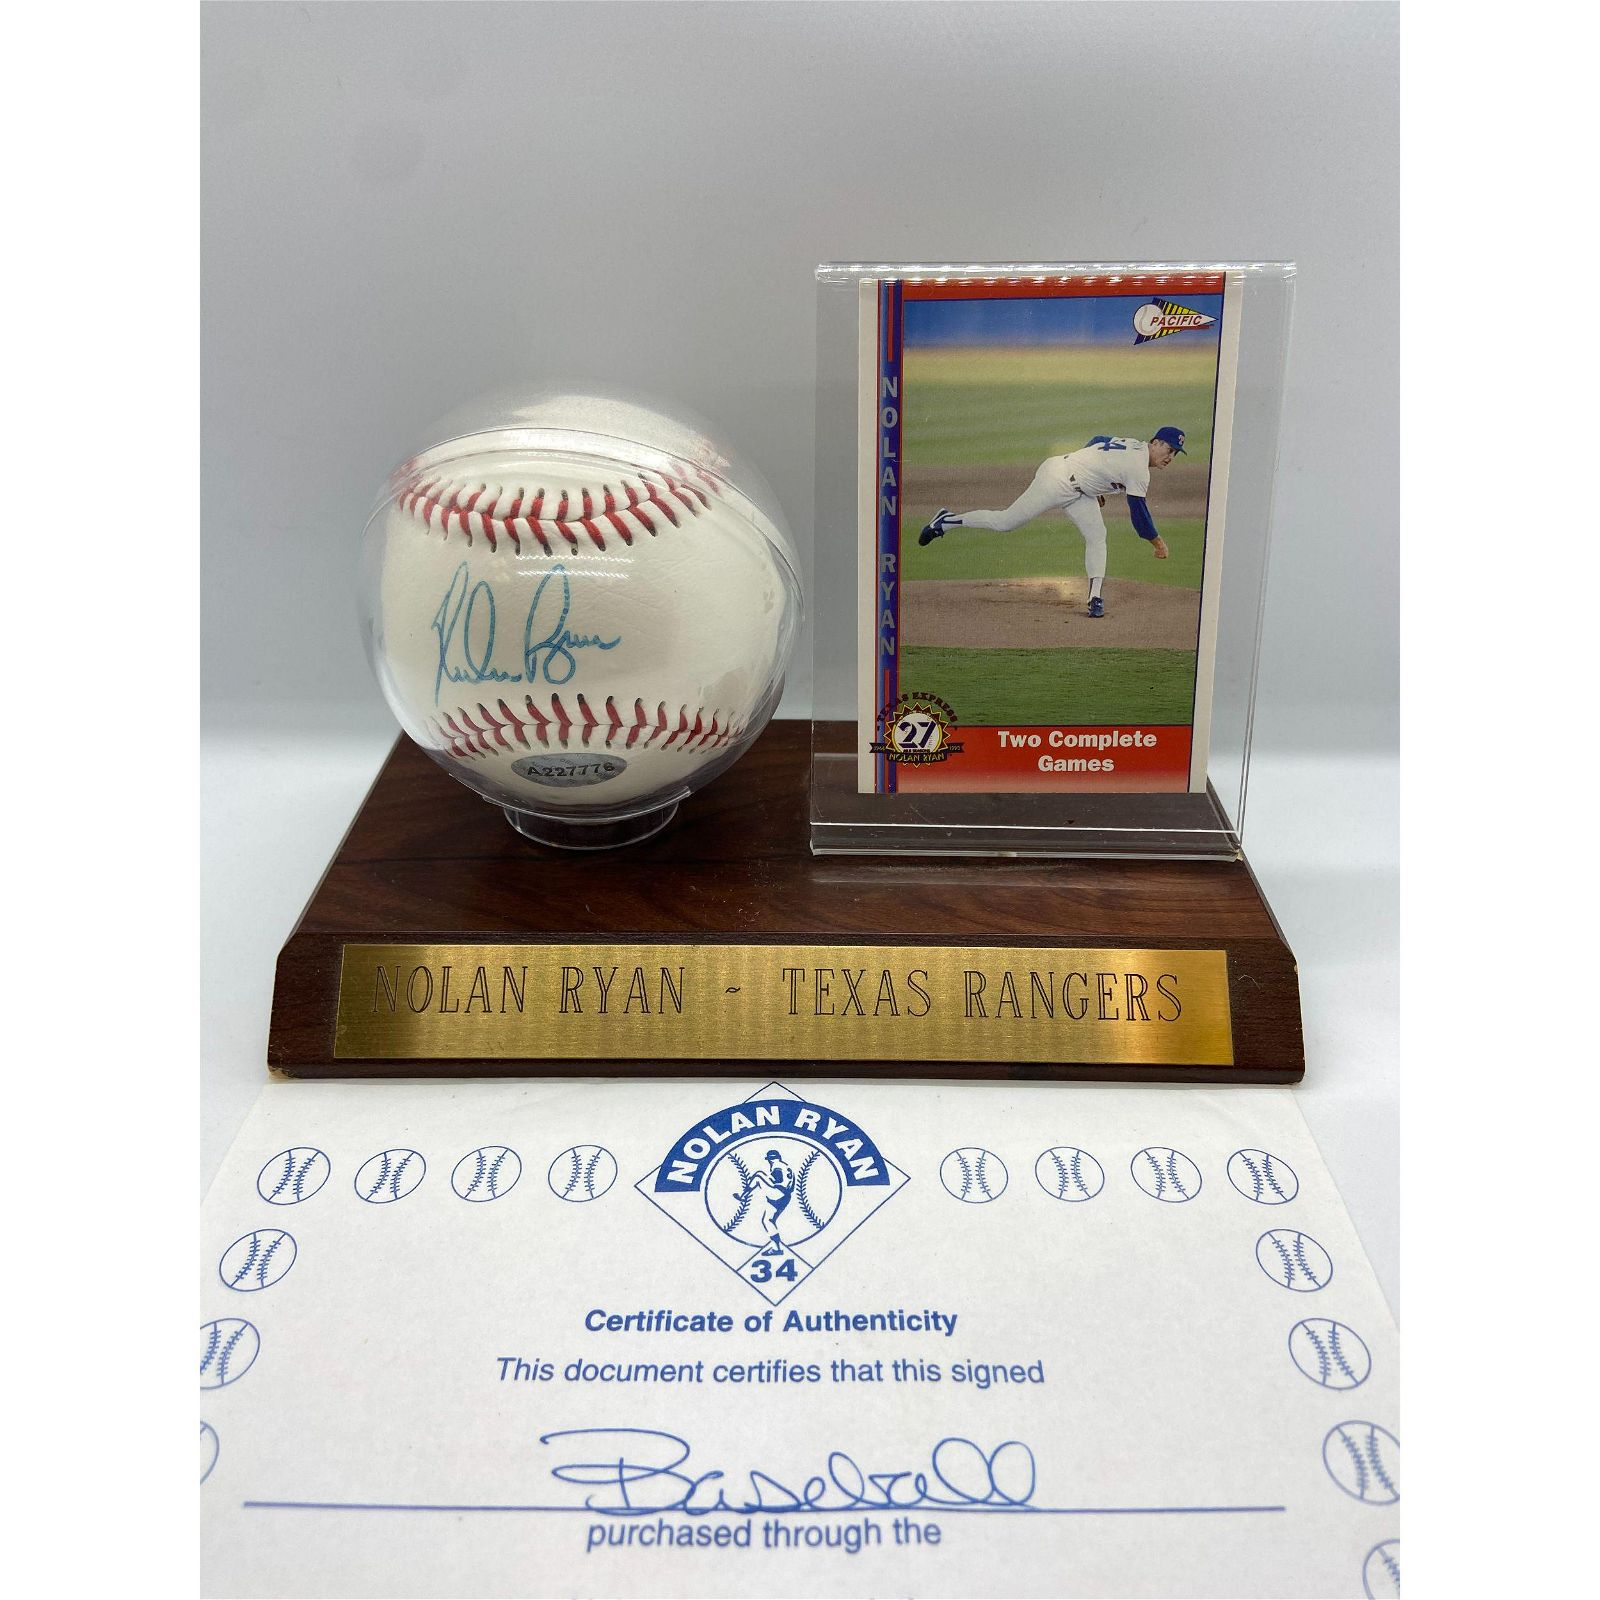 Authentic MLB Texas Rangers NOLAN RYAN Autographed Base